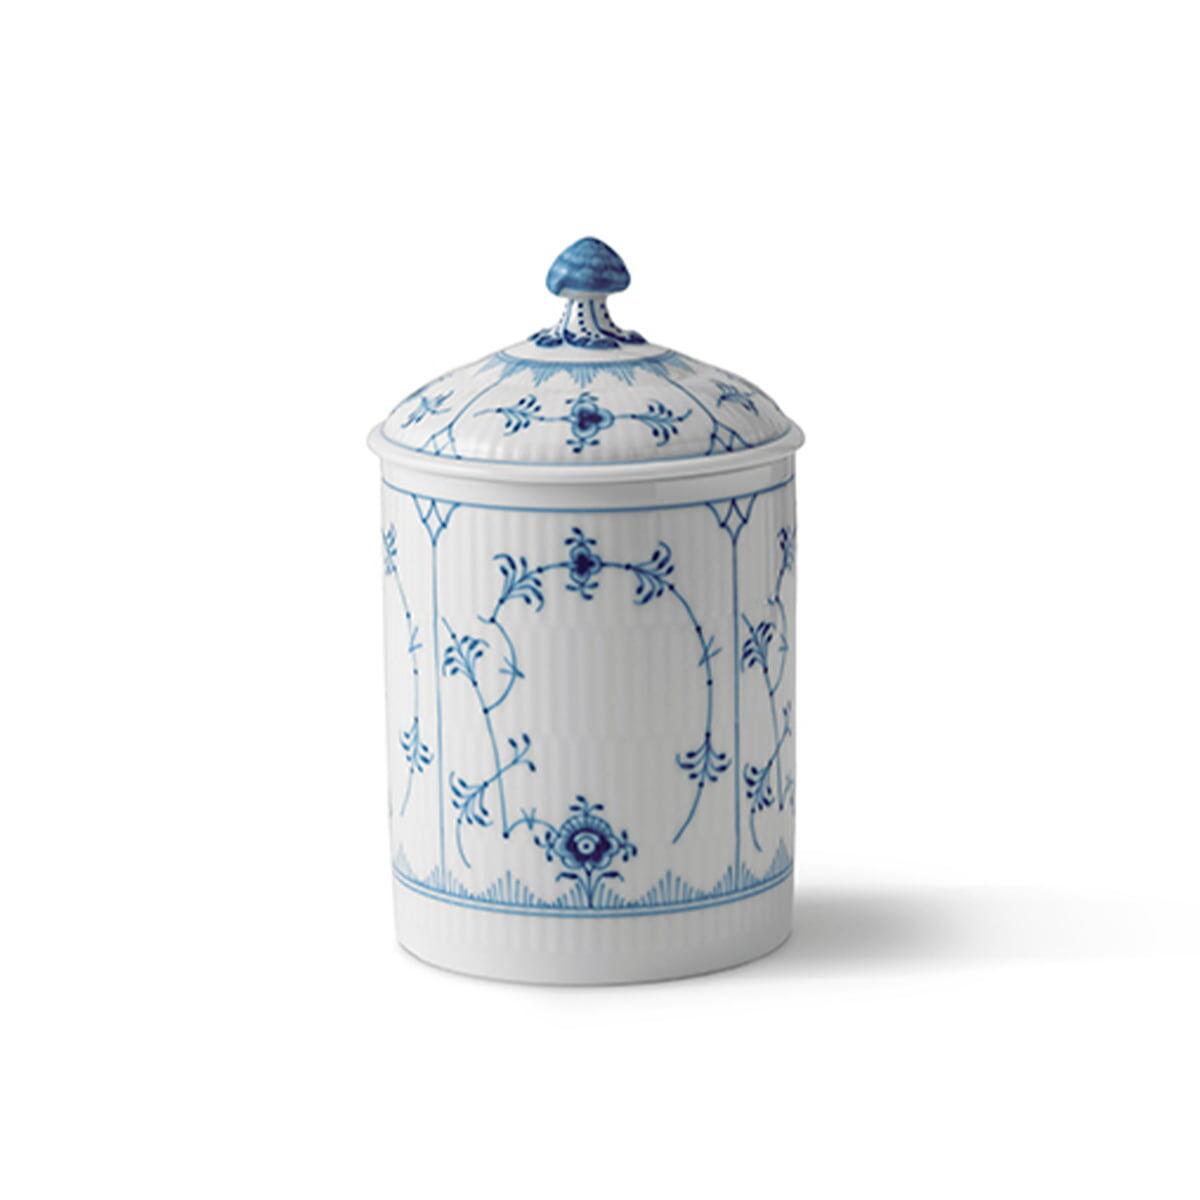 Royal Copenhagen - Musselmalet Dose mit Deckel 16 cm